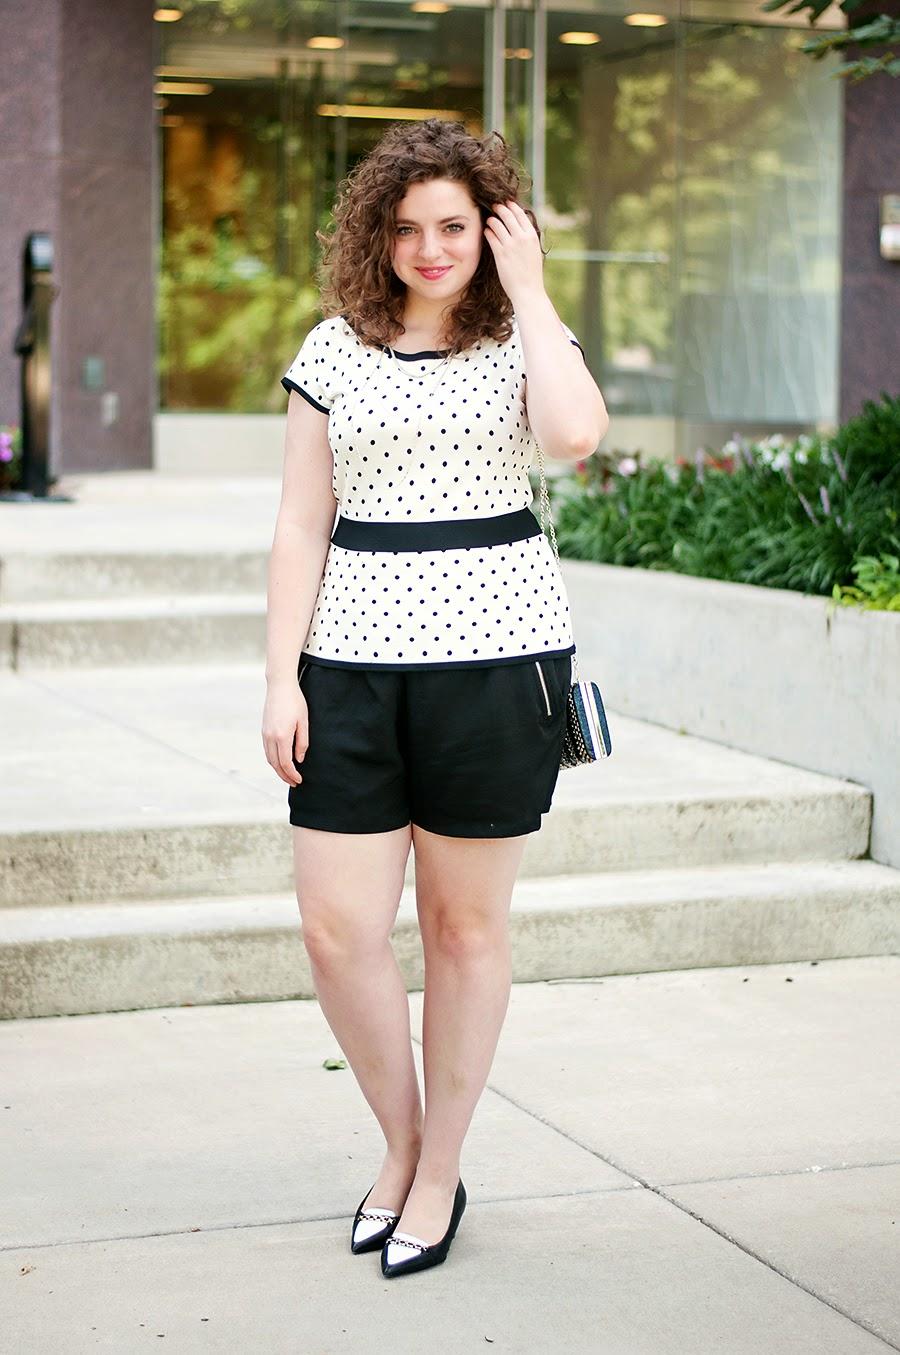 Polka dot top and silk shorts outfit